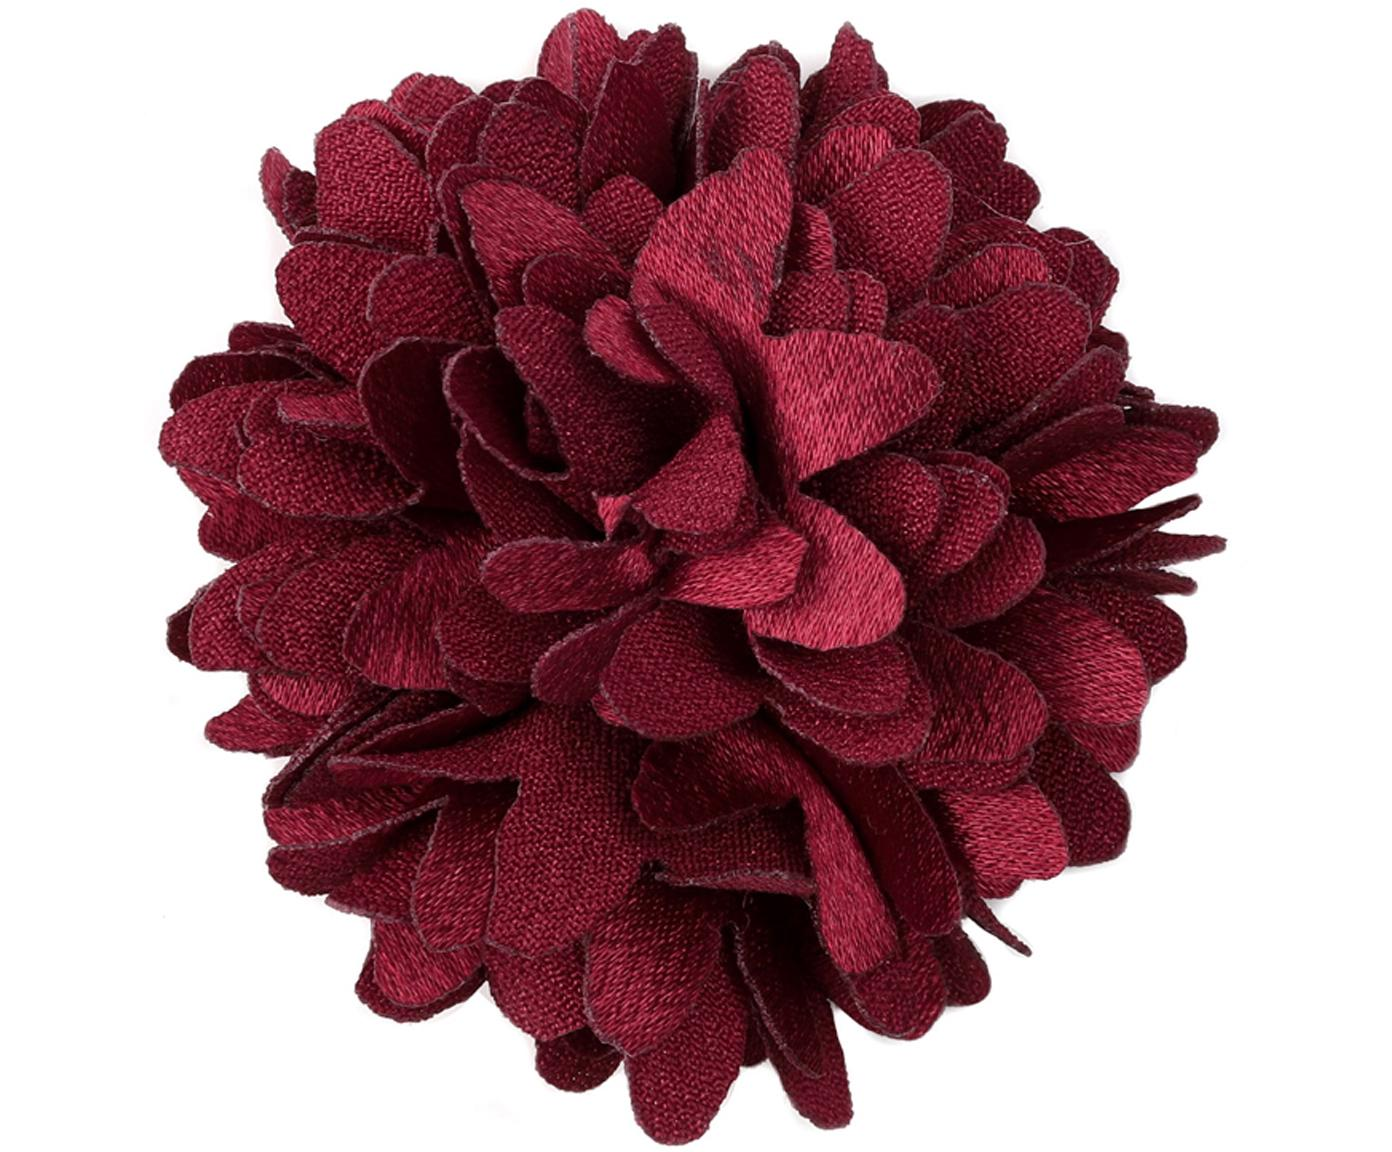 Deko-Blumen Flor, 6 Stück, Polyester, Rot, Ø 6 cm